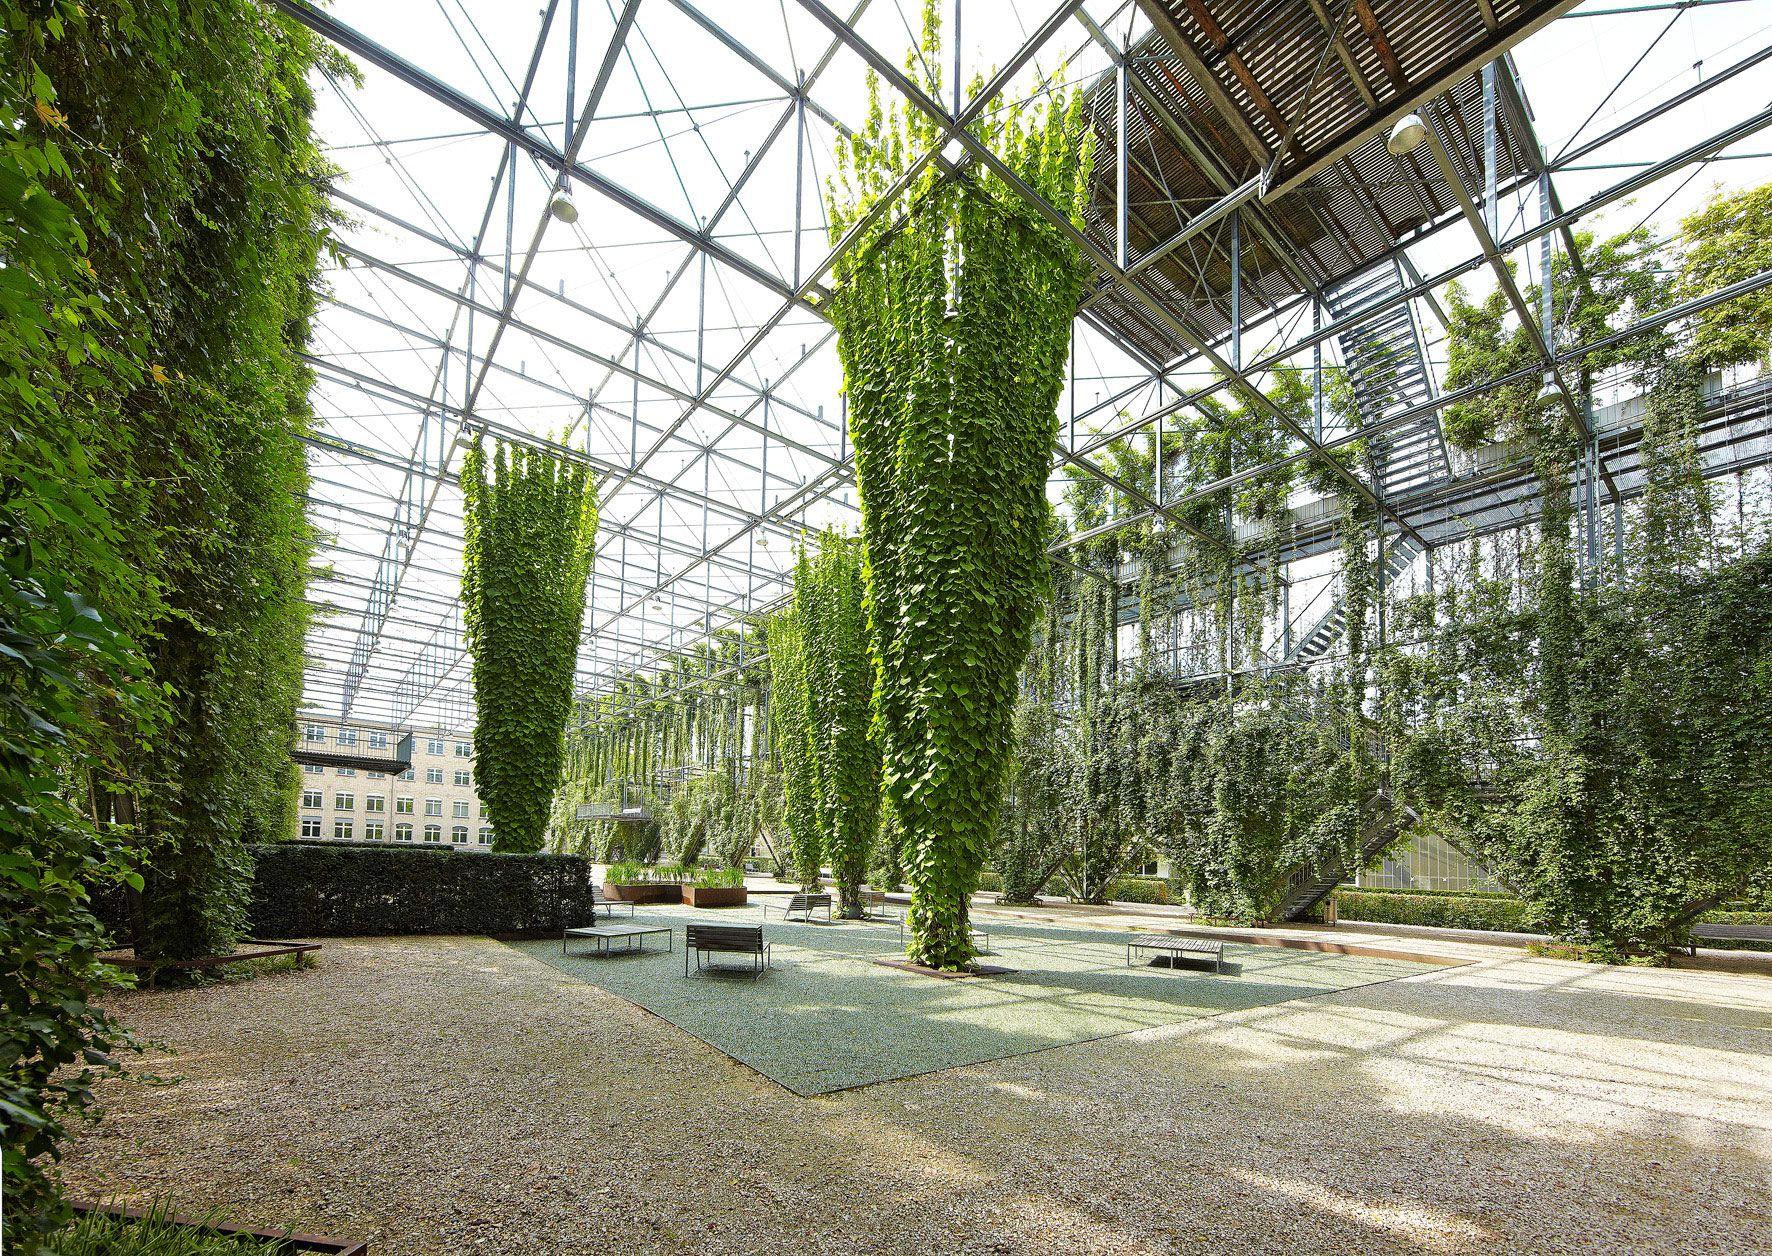 Mfo park vertical garden zurich landscape pinterest for Paisajismo vertical